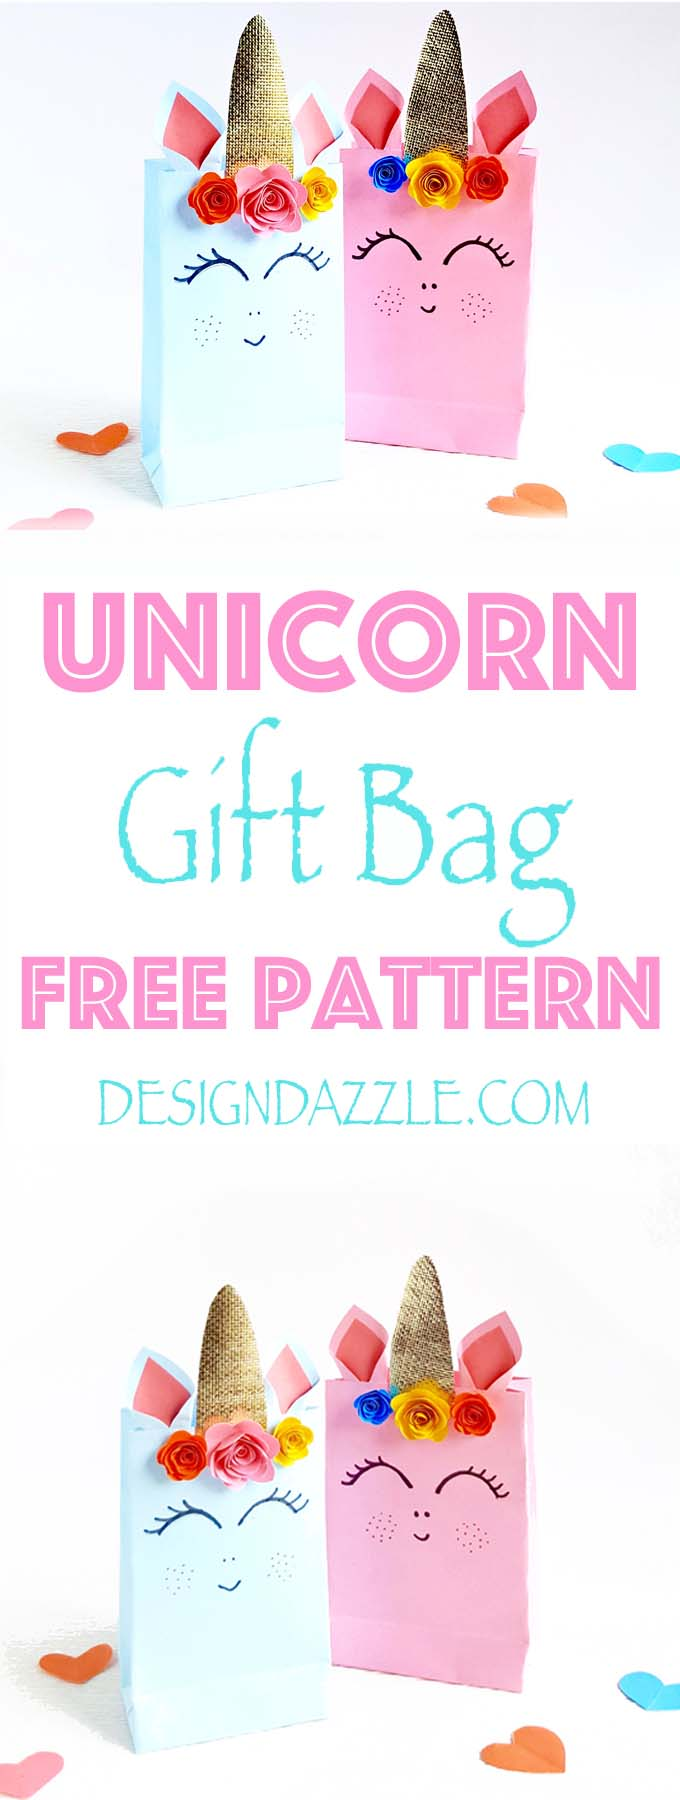 http://www.designdazzle.com/wp-content/uploads/2018/02/UNICORN.jpg